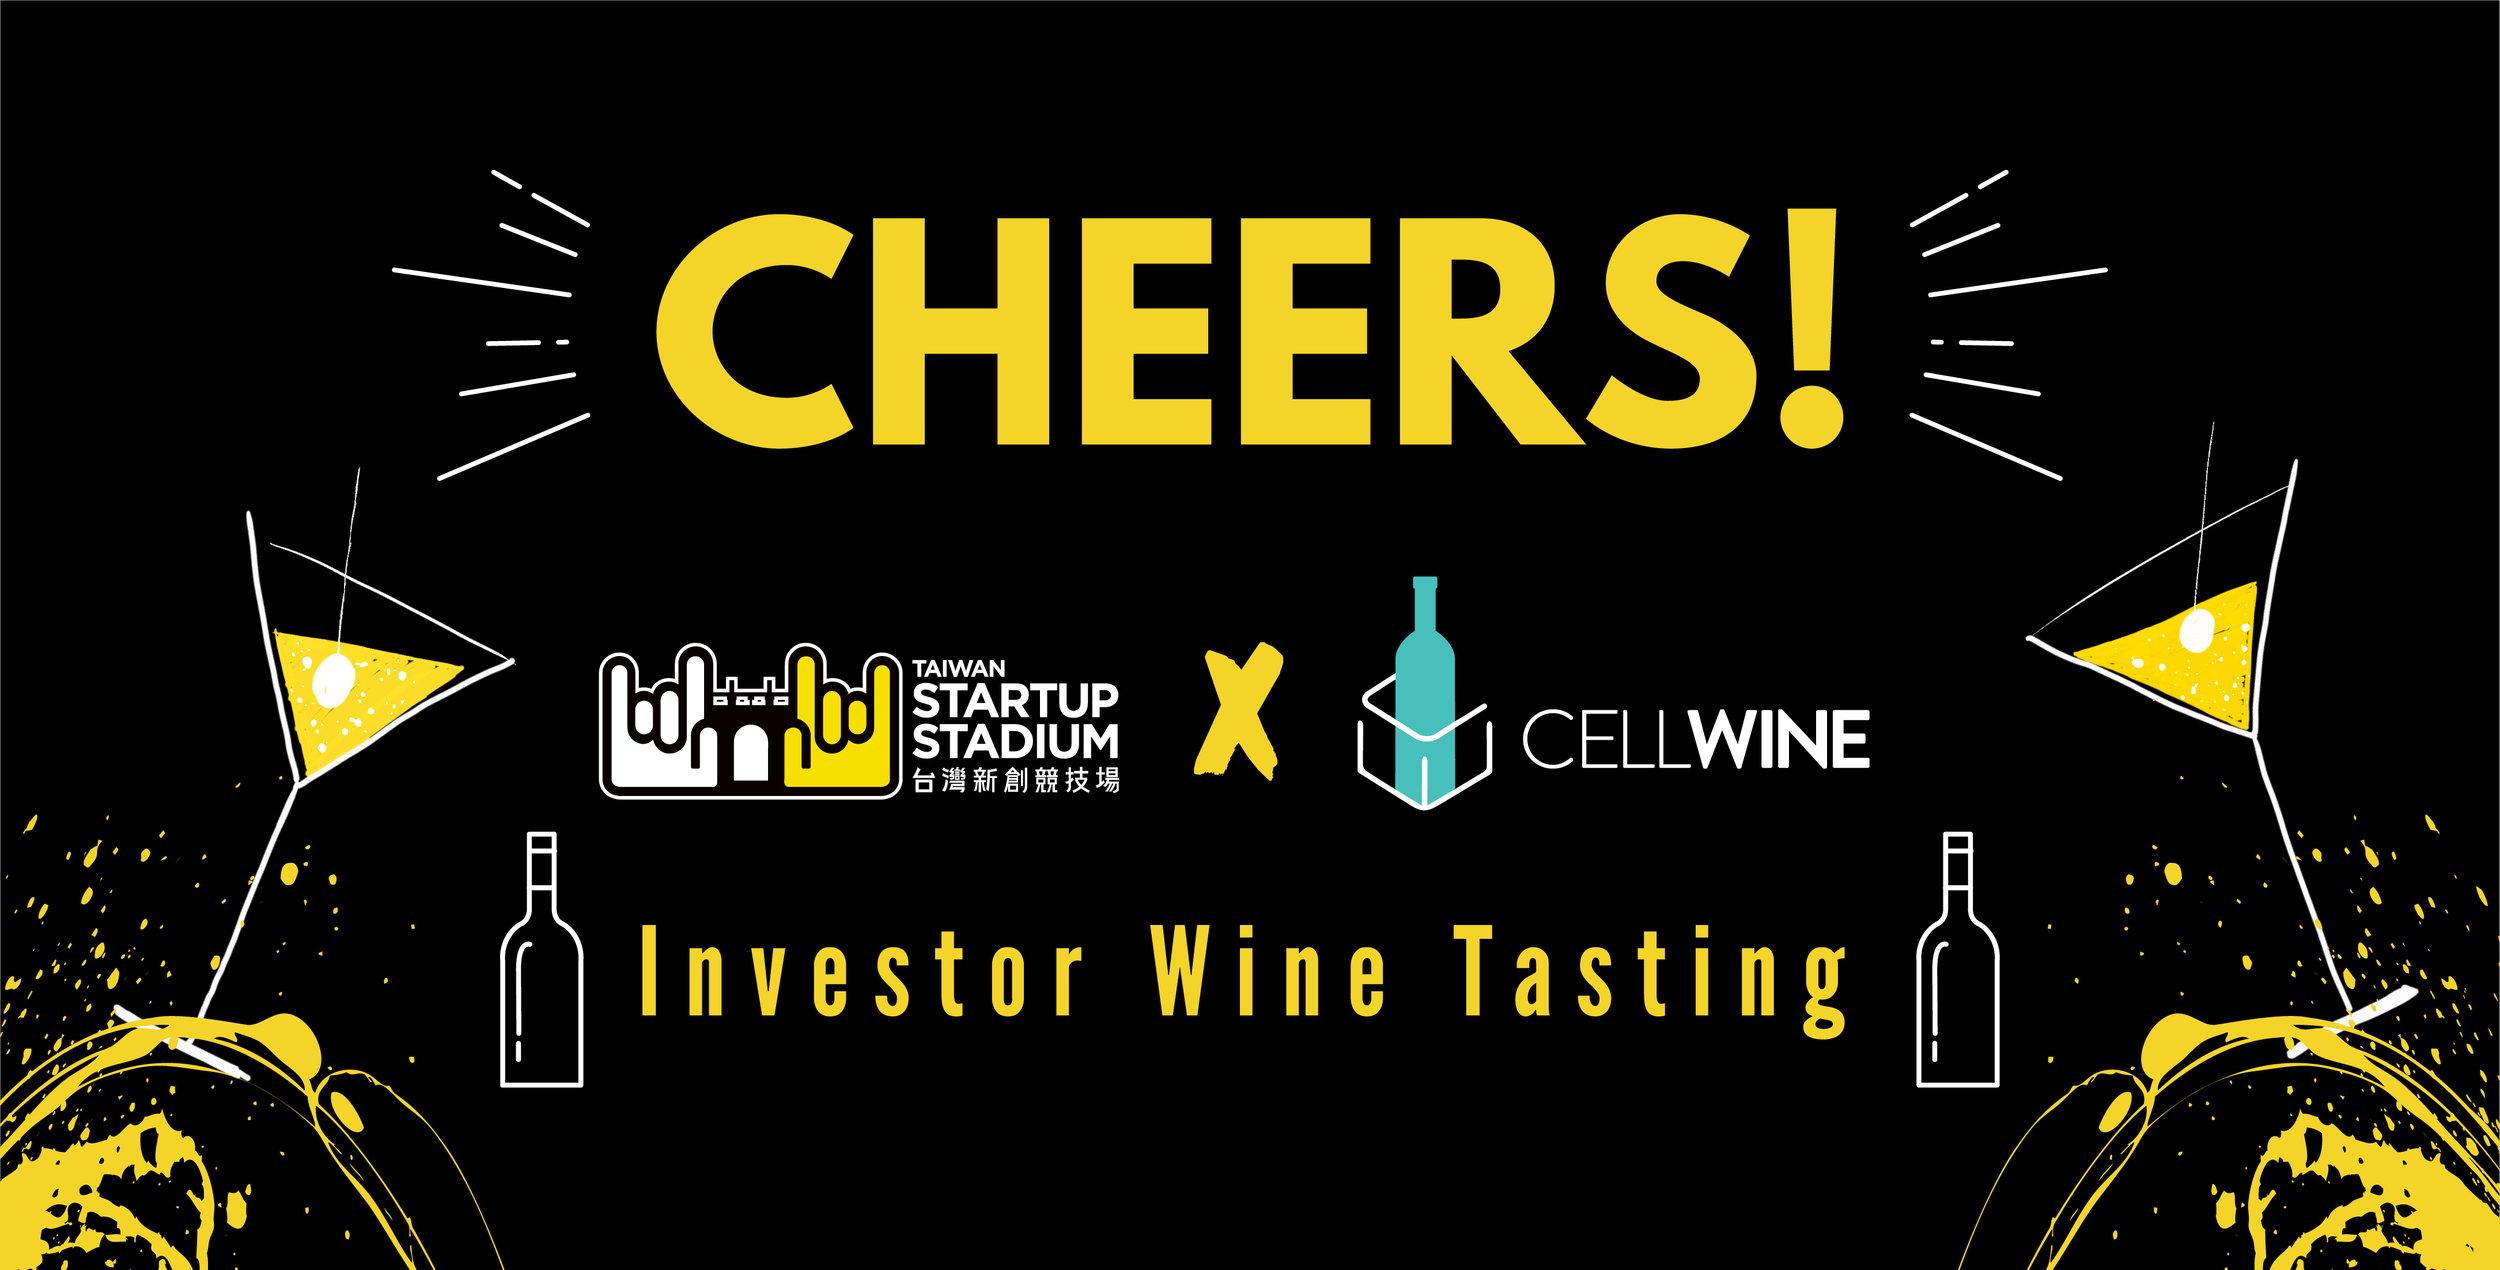 inverstor wine tasting event_更新.jpg